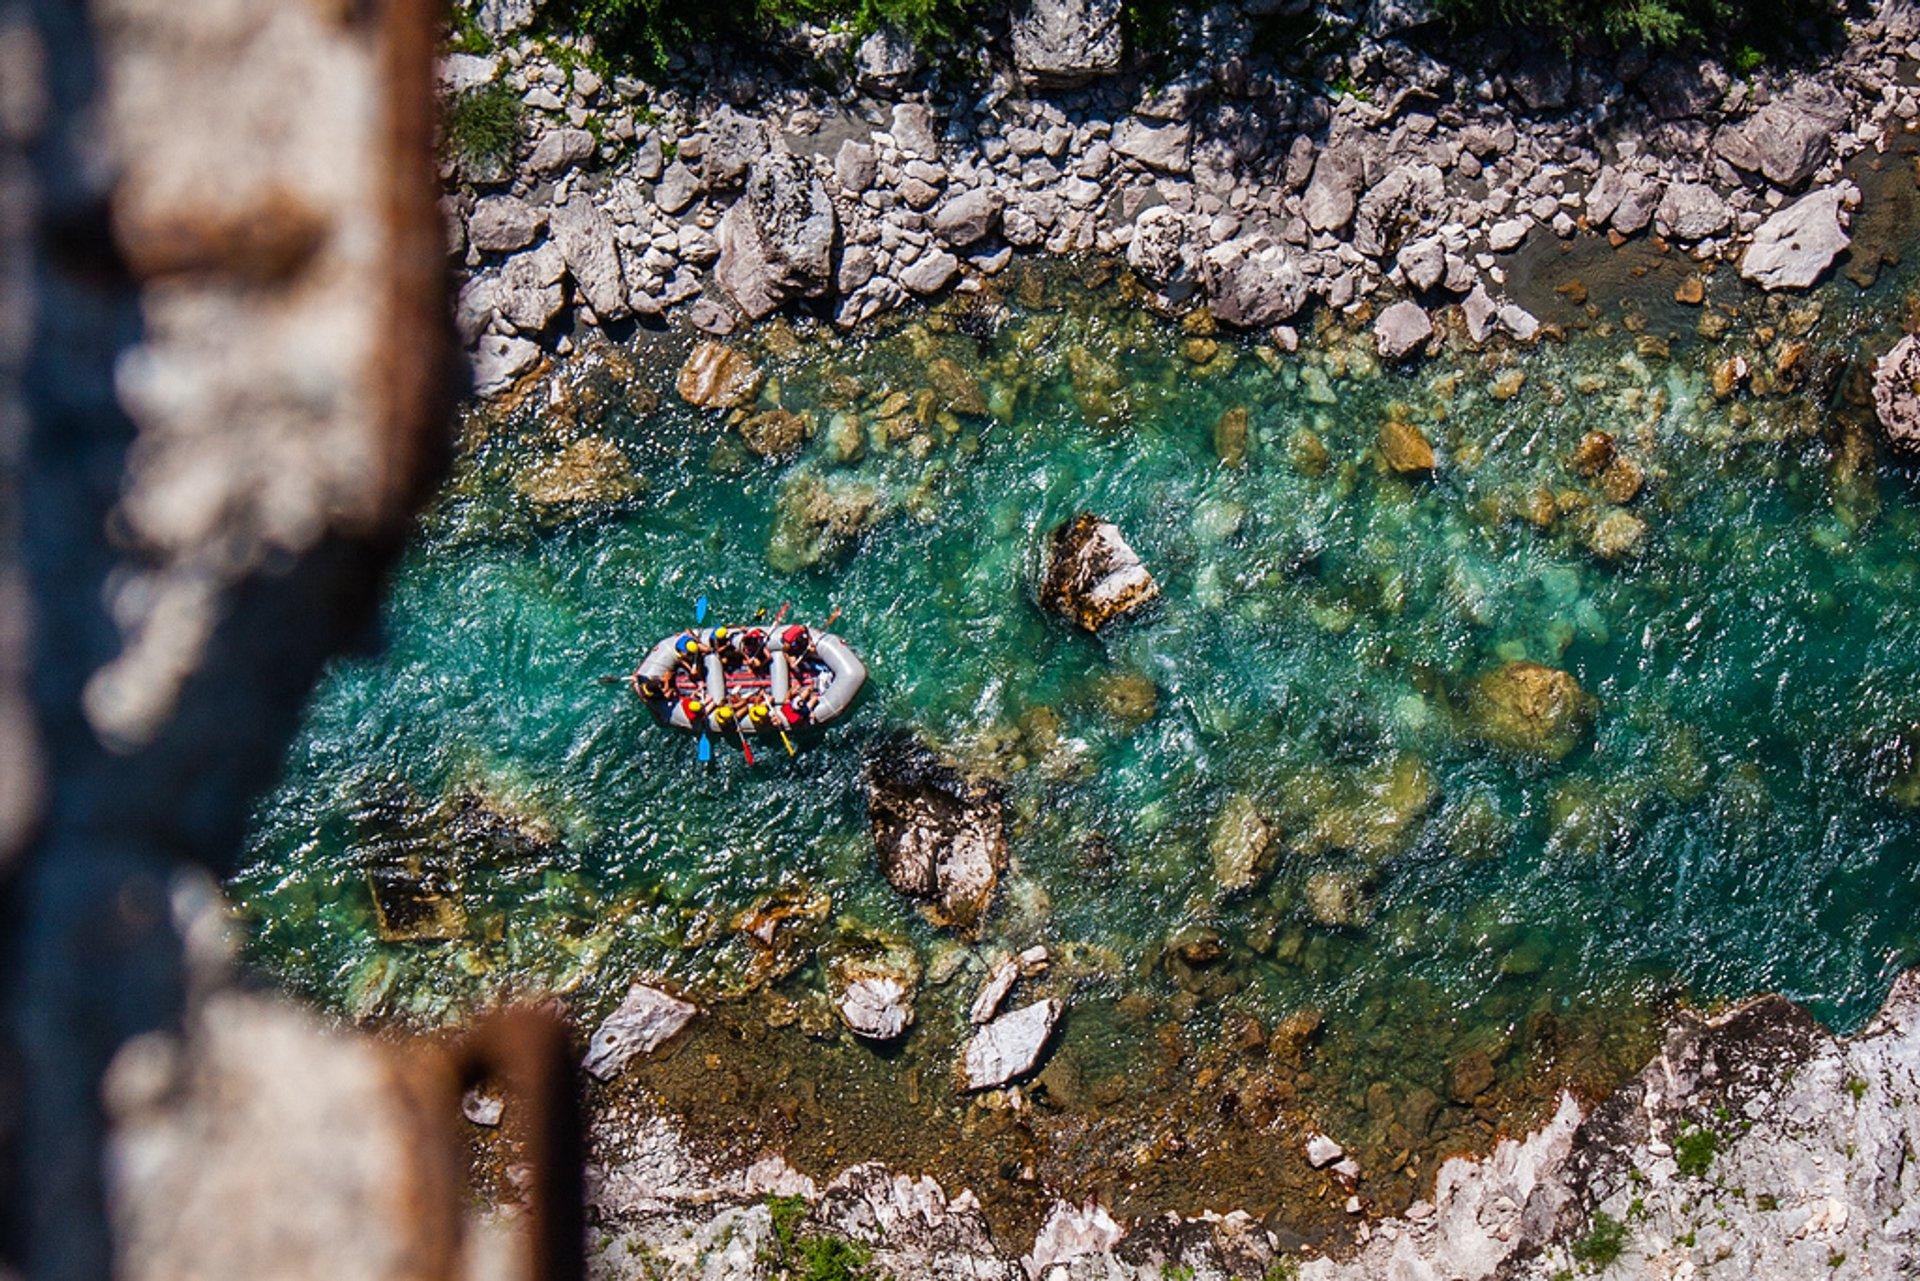 Rafting in Montenegro 2020 - Best Time